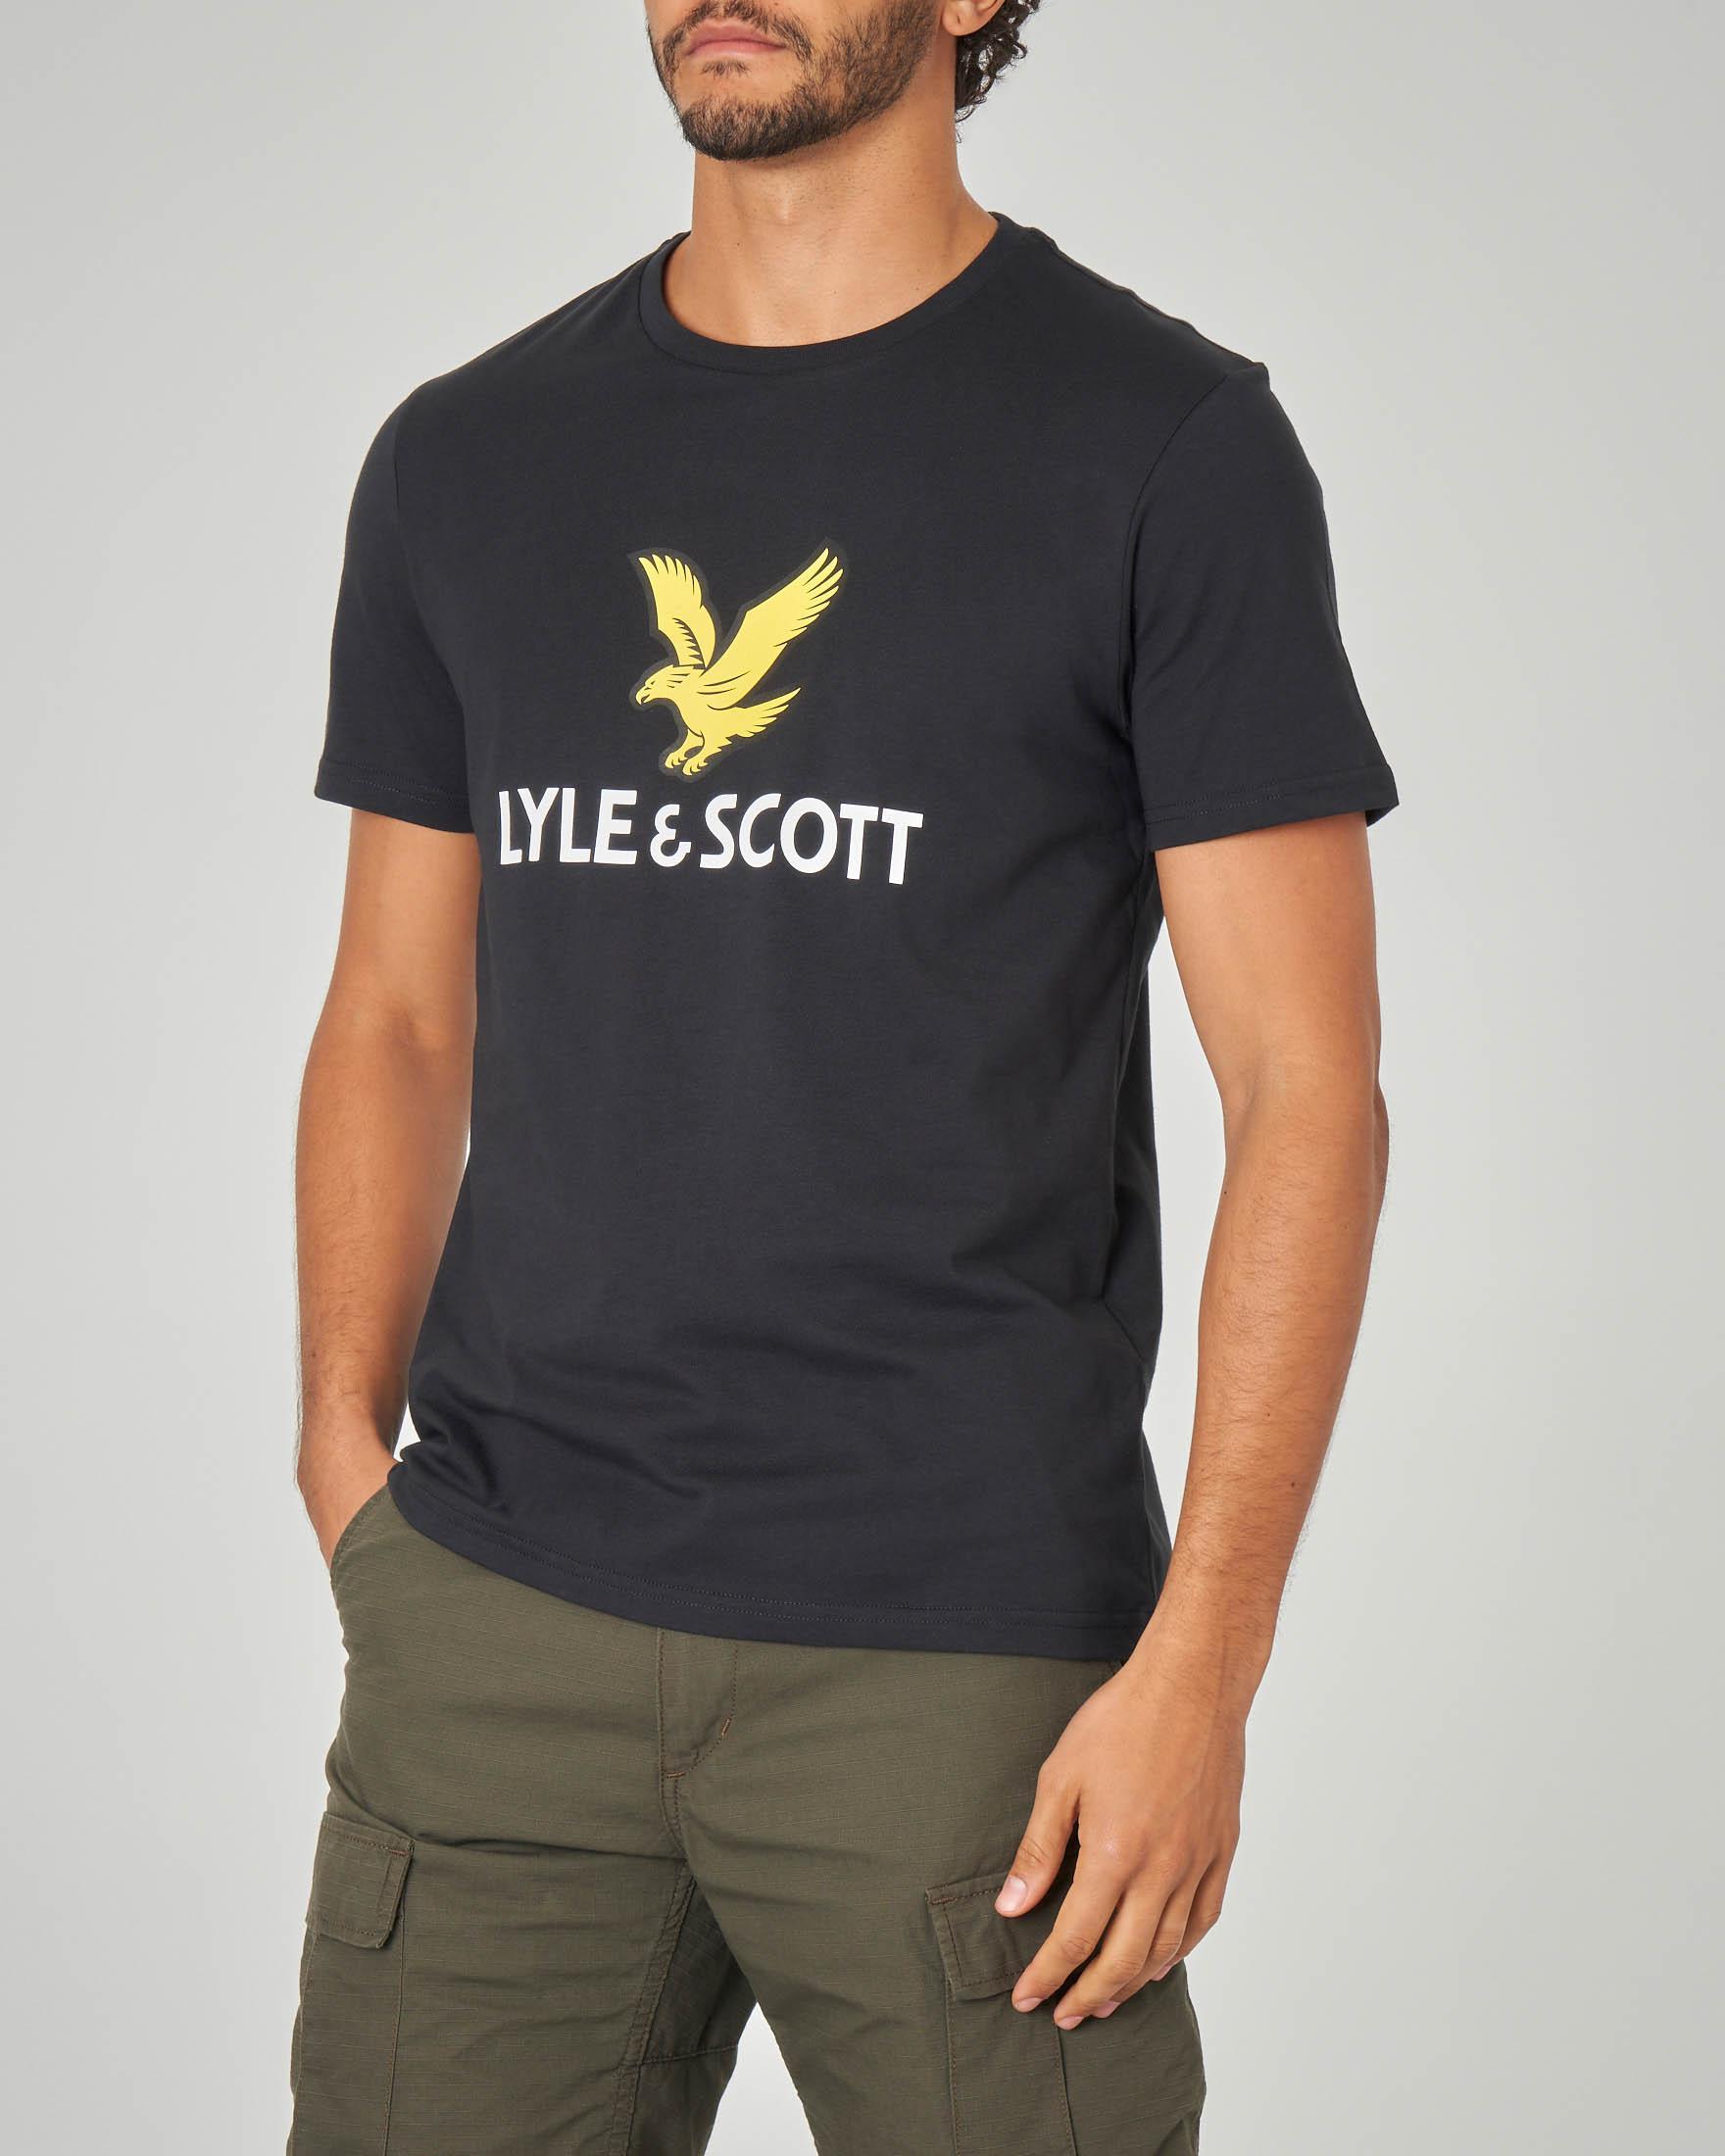 T-shirt nera con maxi-logo